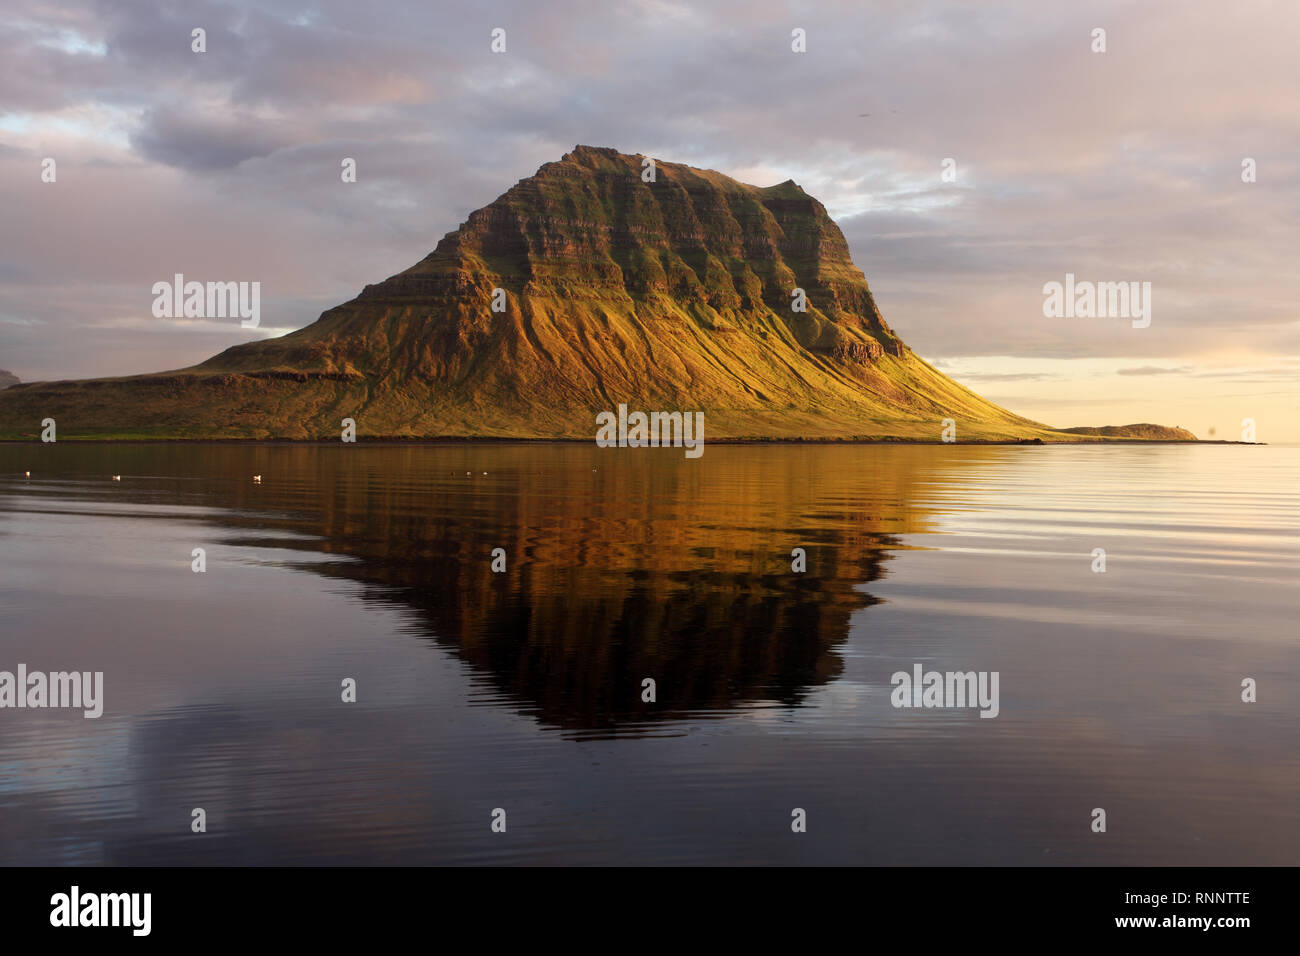 Erloschene Vulkan in Island. Mount Kirkjufell in der Halbinsel Snaefellsnes, Island. Stockbild